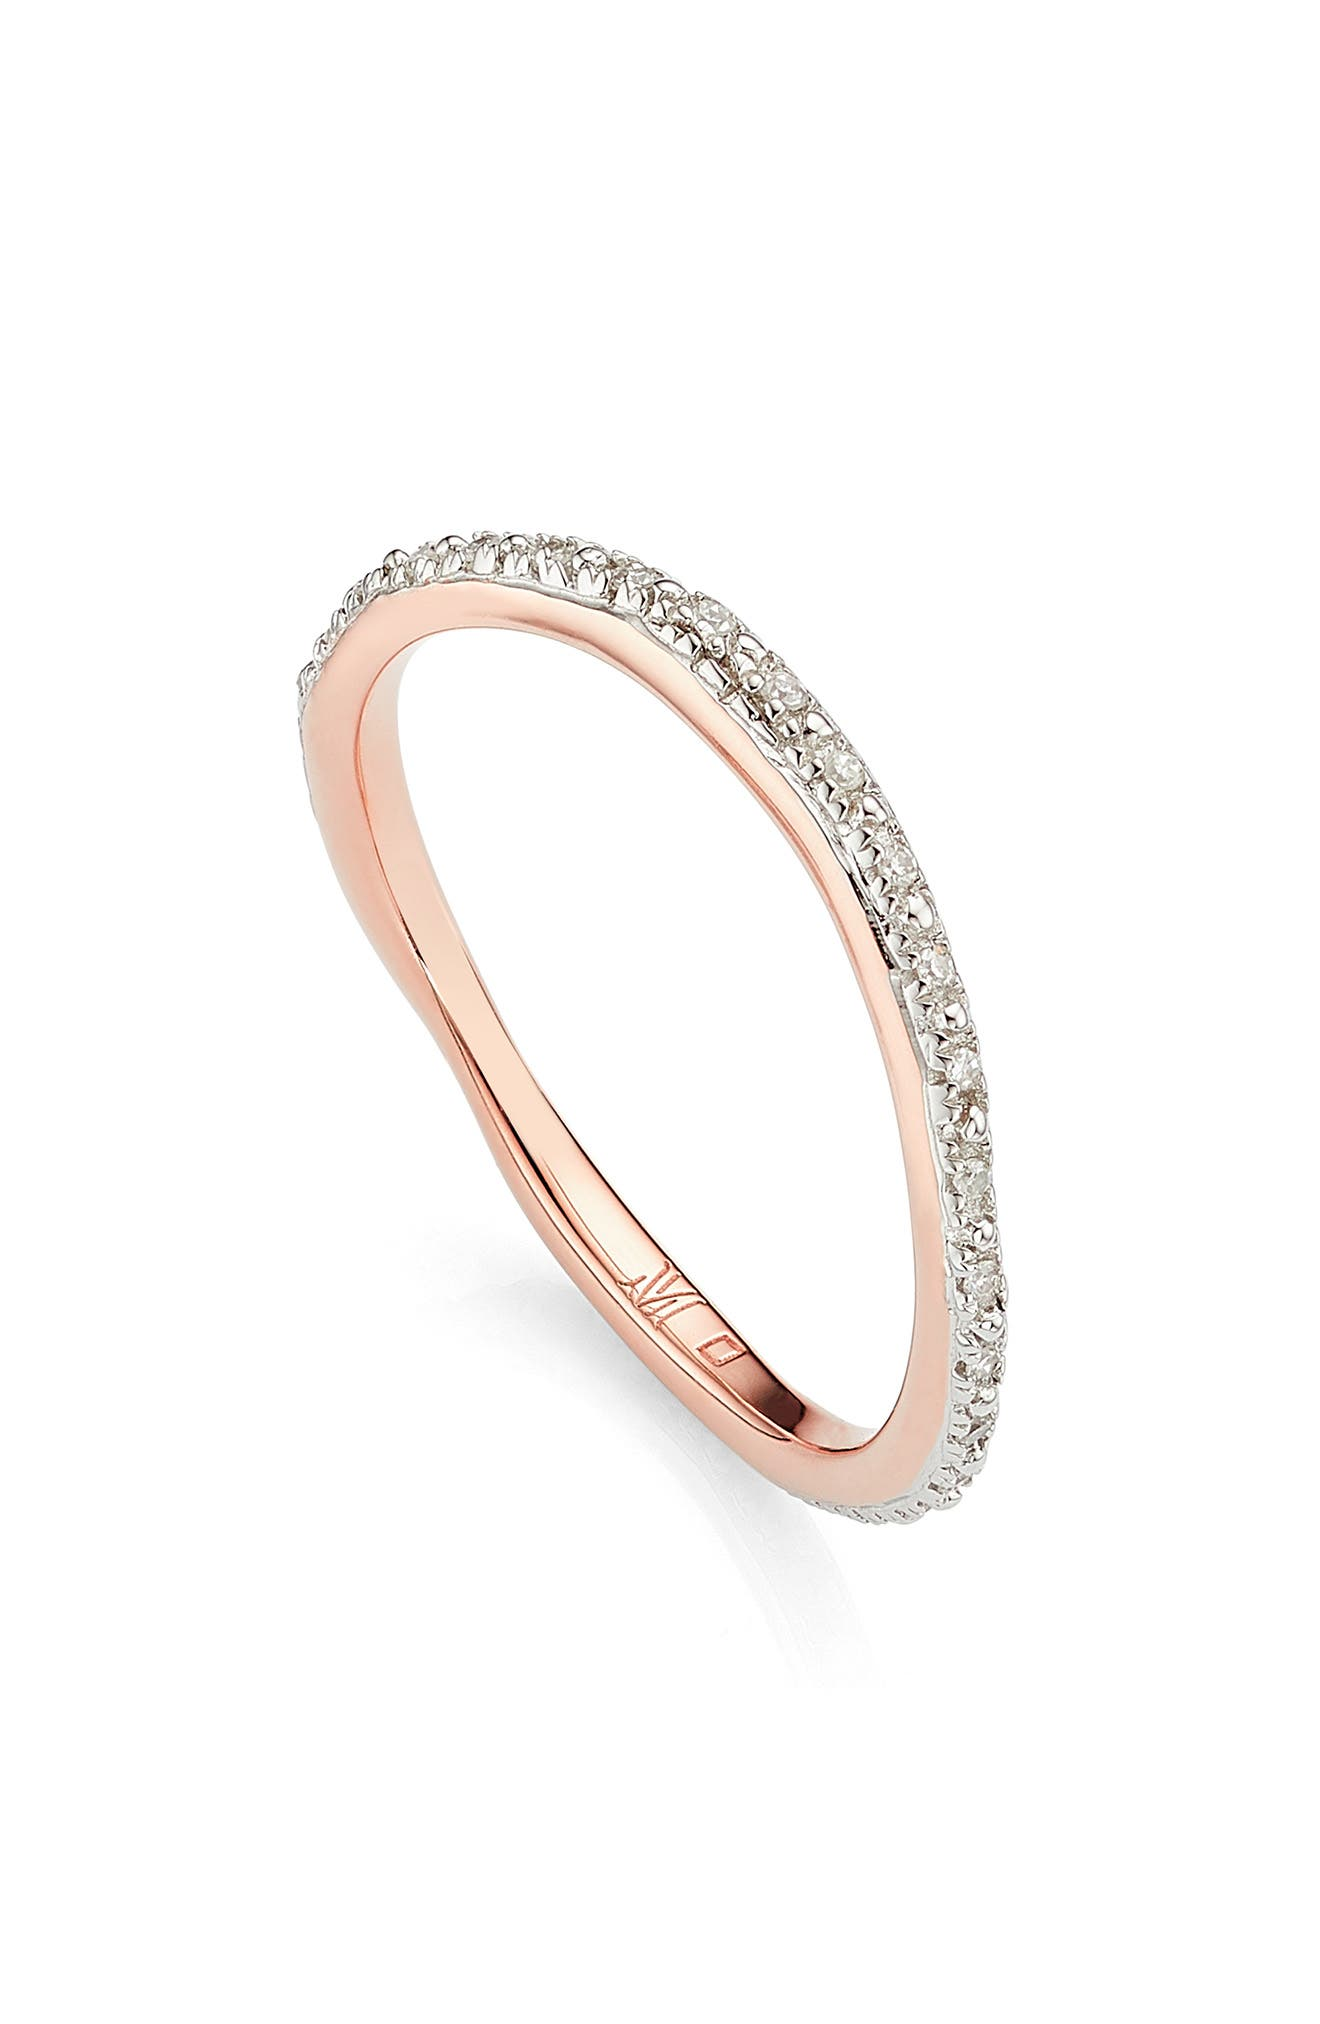 MONICA VINADER, Riva Wave Diamond Eternity Ring, Main thumbnail 1, color, ROSE GOLD/ DIAMOND